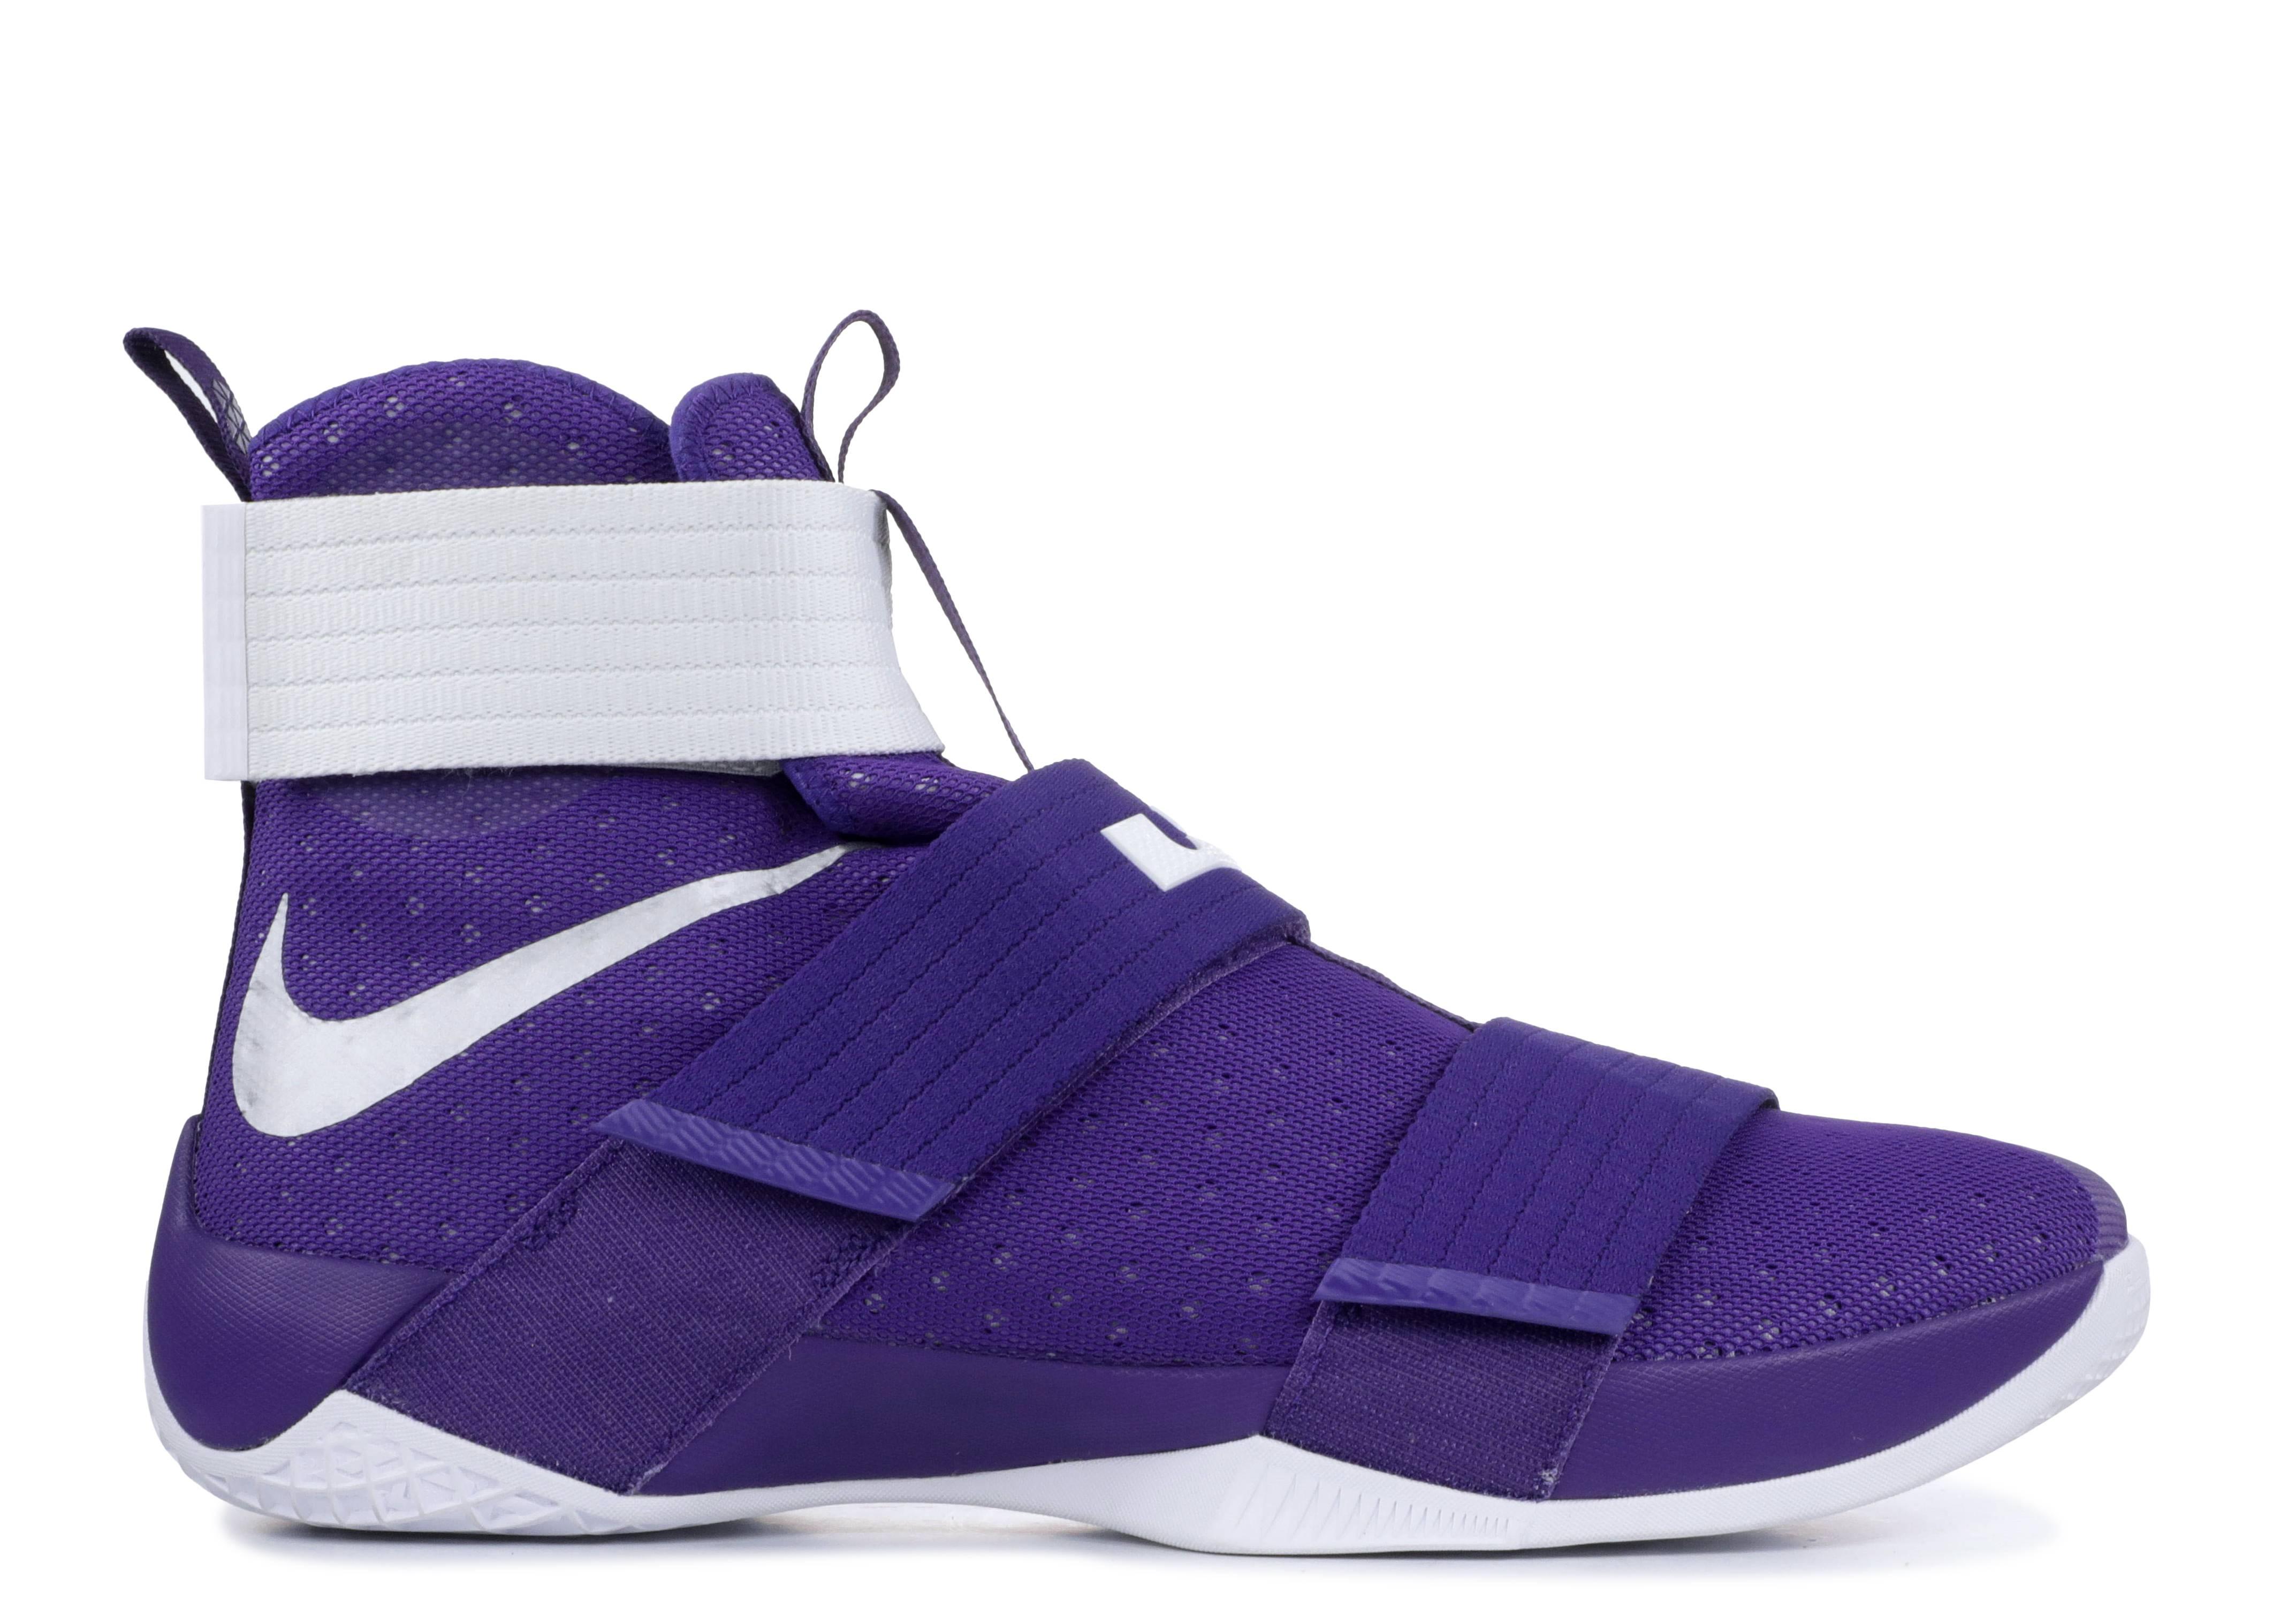 lebron soldier 10 tb 'purple'